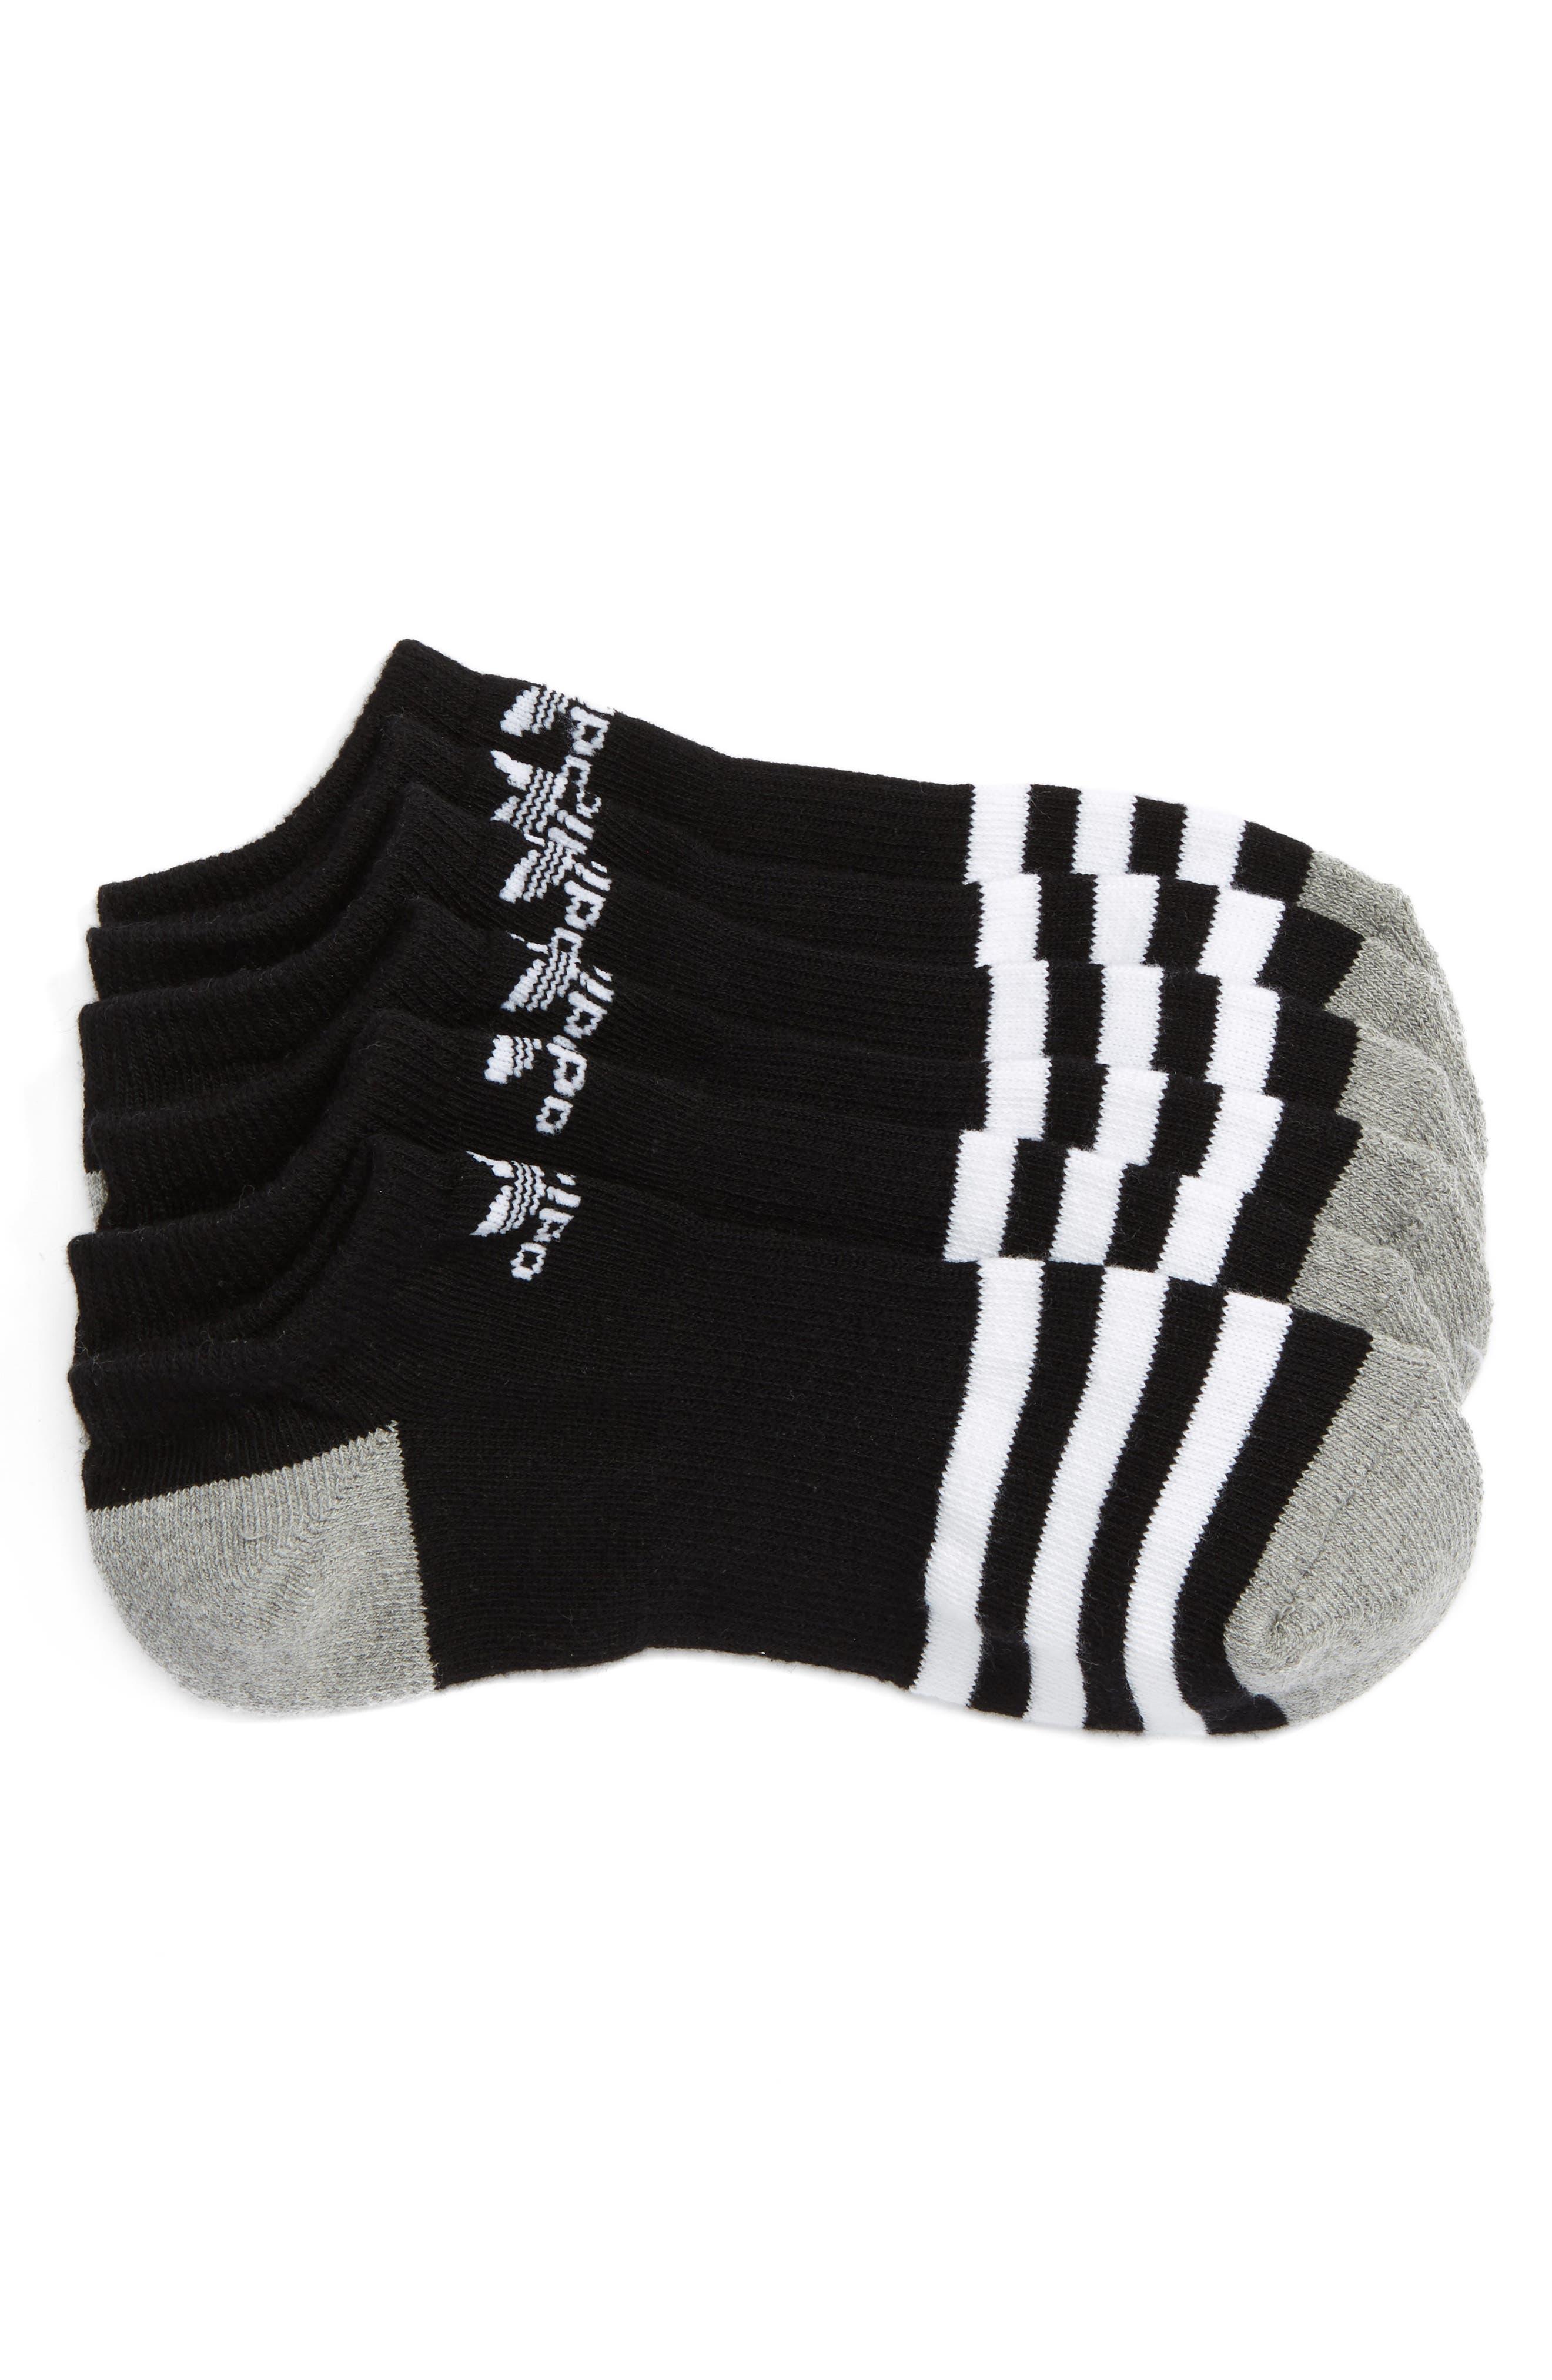 3-Pack Original Cushioned No-Show Socks,                         Main,                         color, BLACK/ WHITE/ BLACK